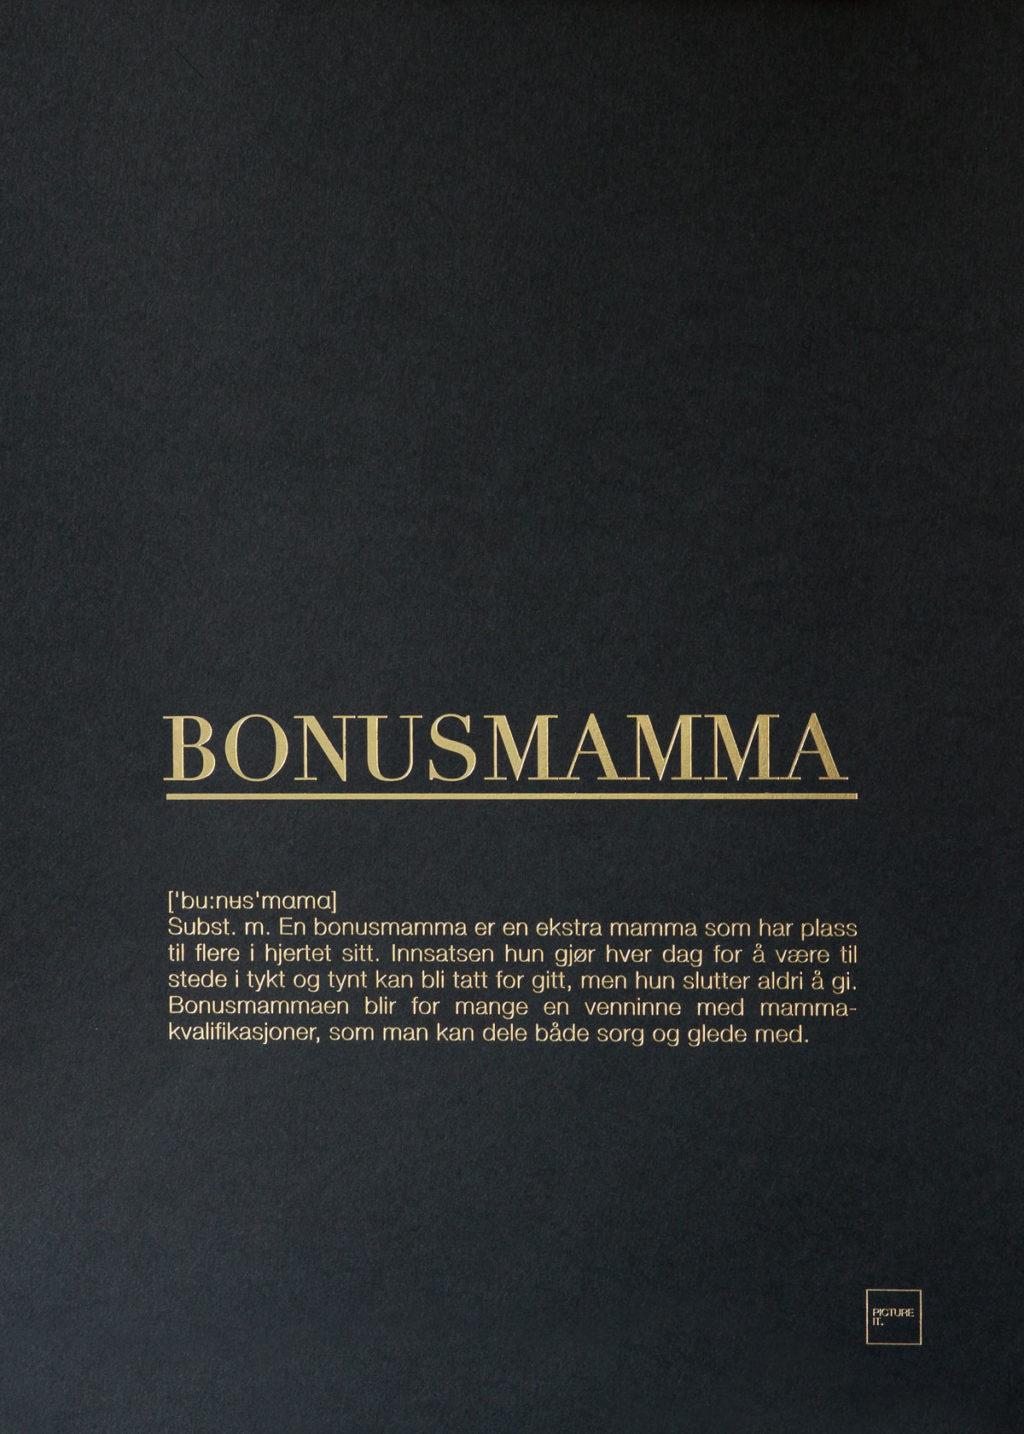 BONUSMAMMA gull poster